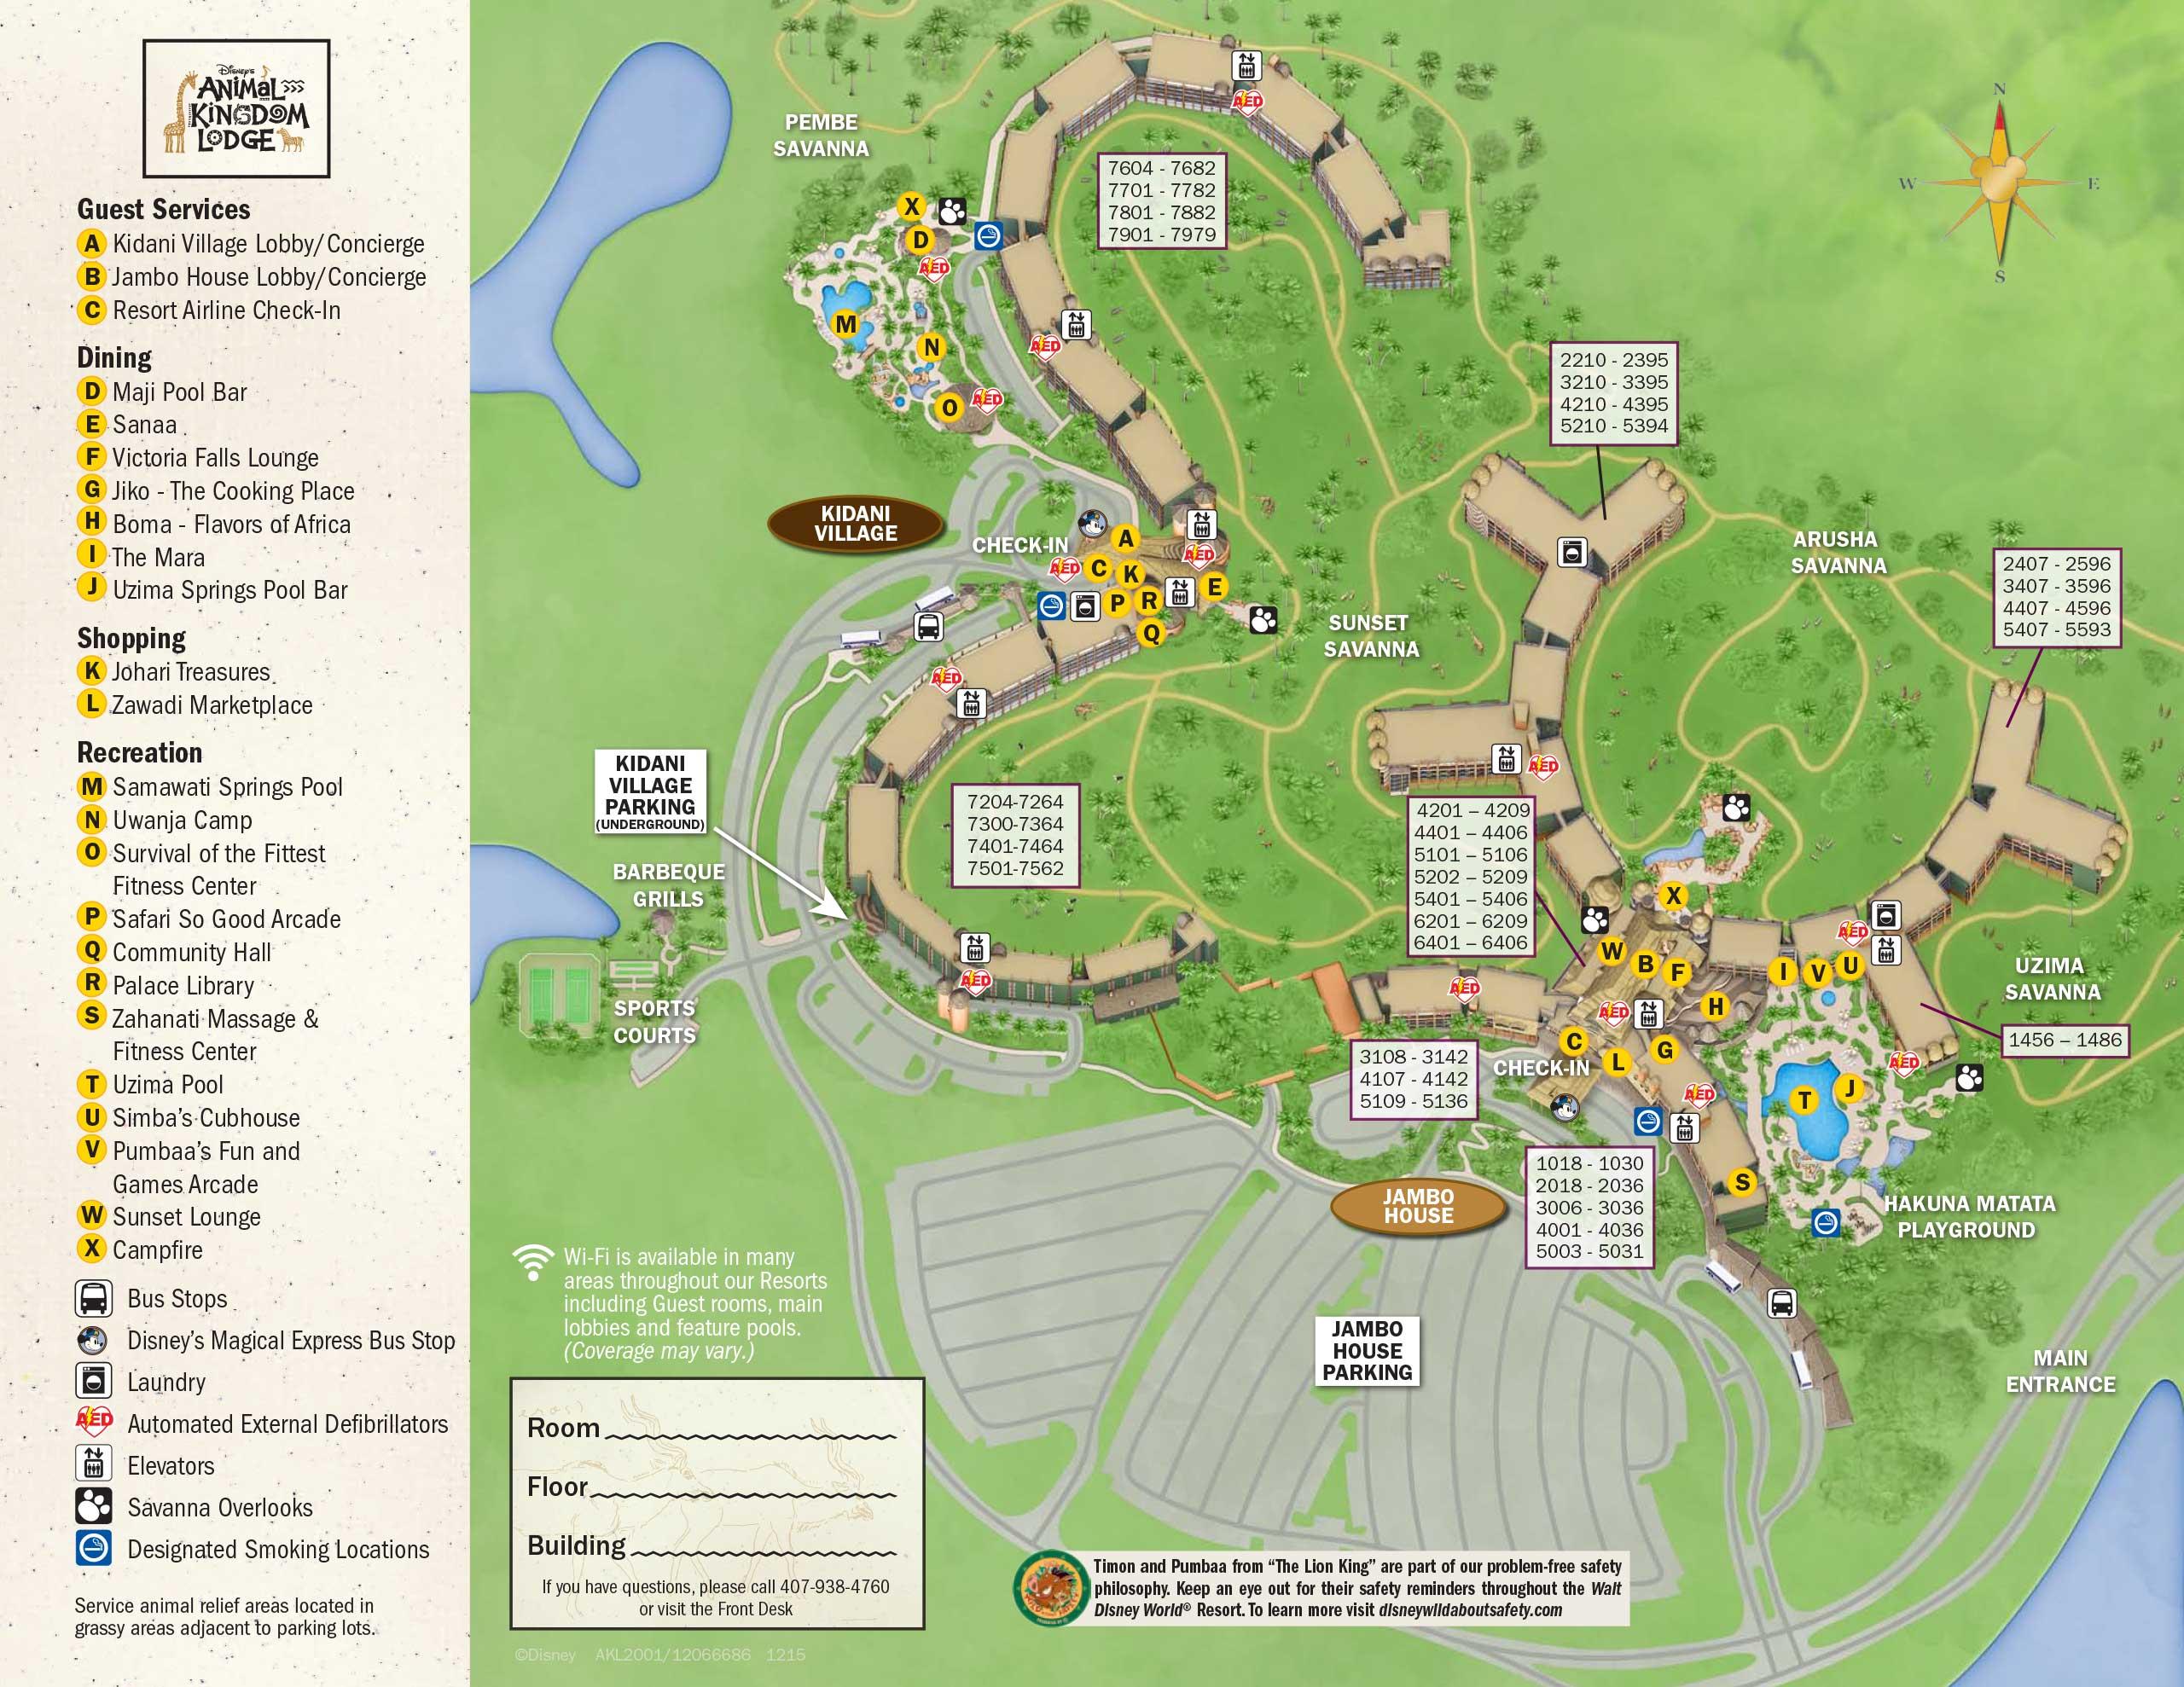 April 2017 Walt Disney World Resort Hotel Maps - Photo 22 of 33 on